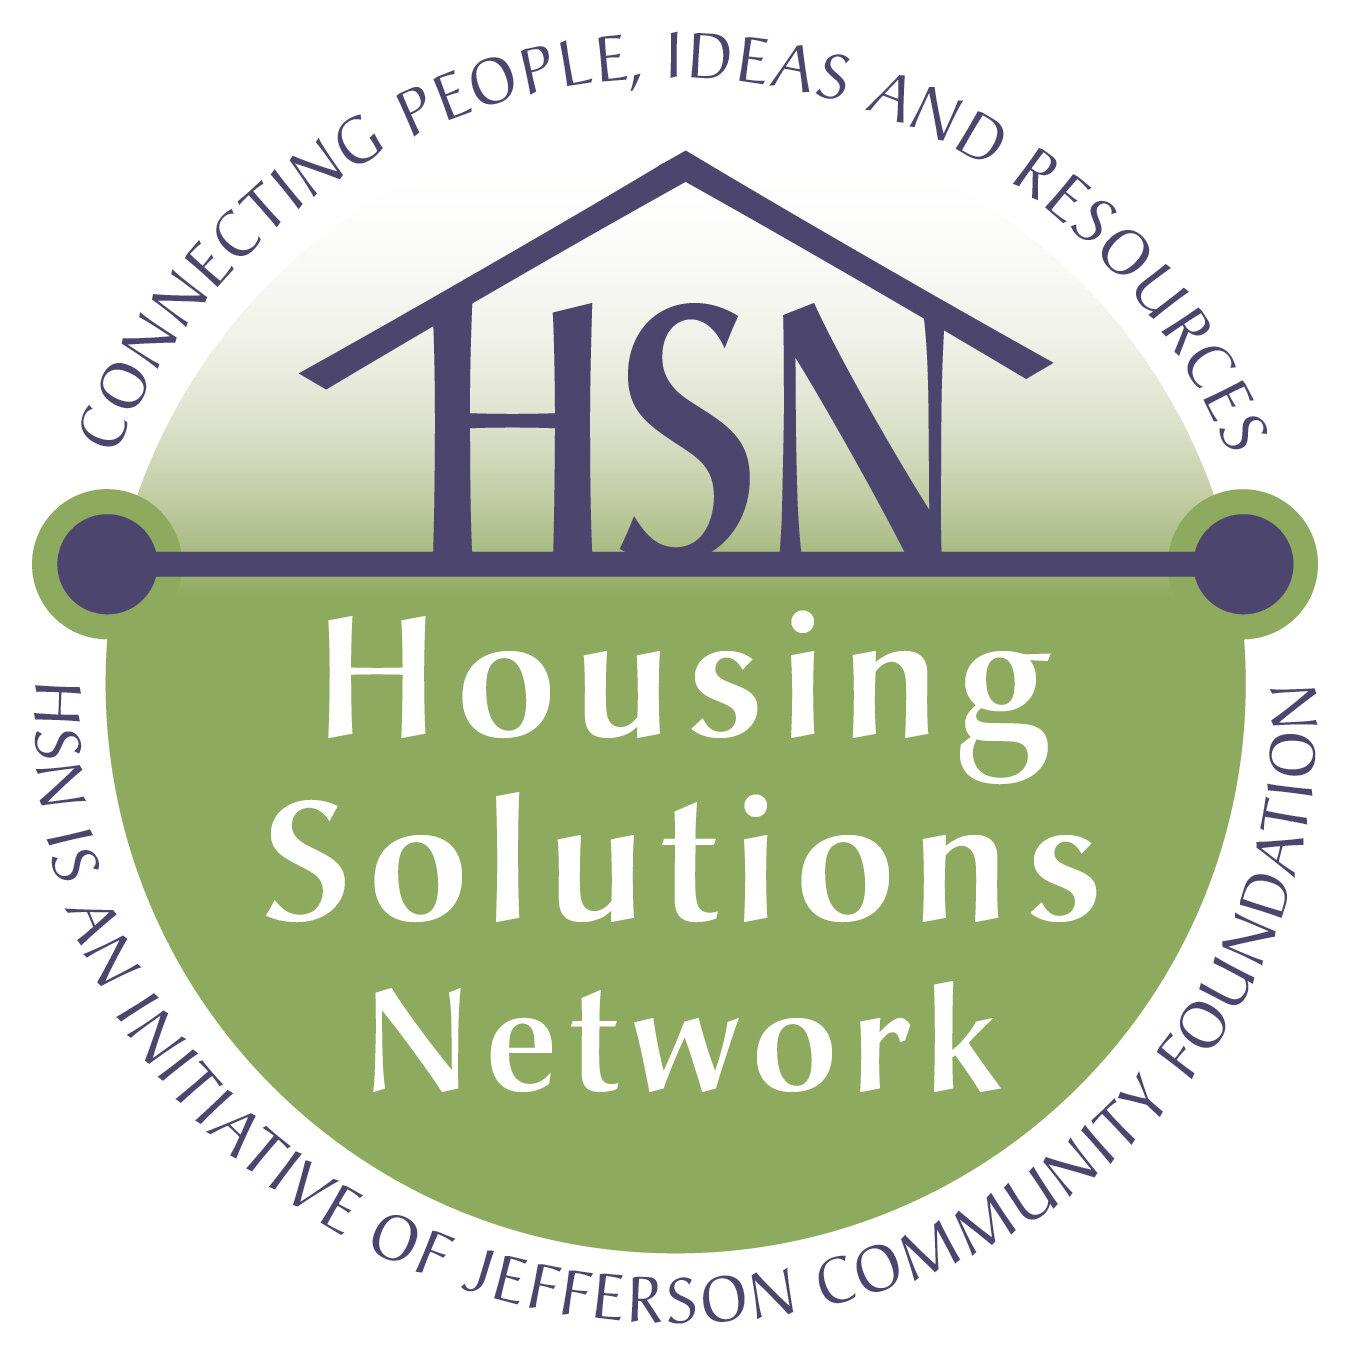 JCHSN_logo1.jpg